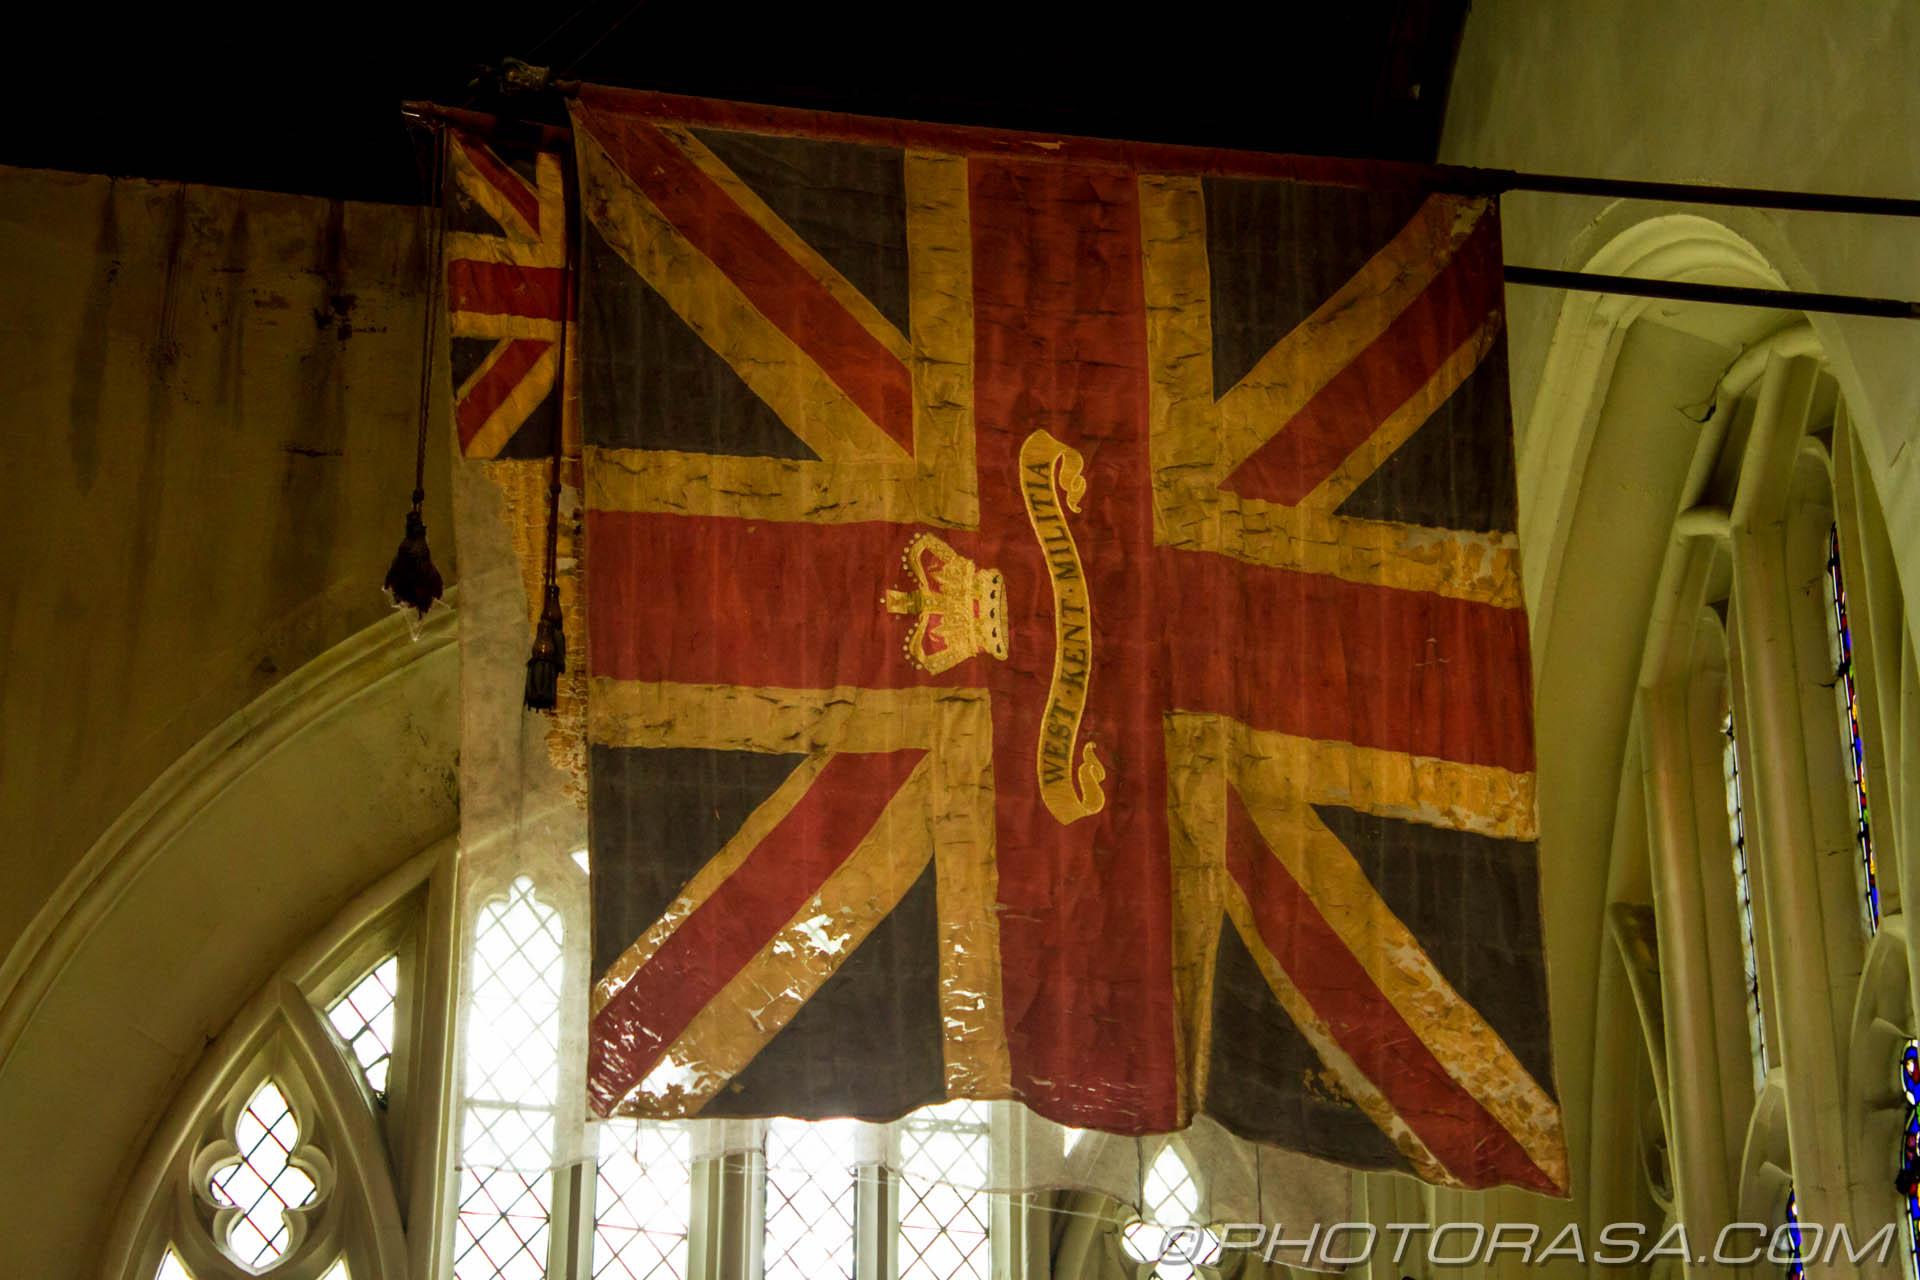 https://photorasa.com/inside-all-saints-church-in-maidstone/old-military-union-flag/